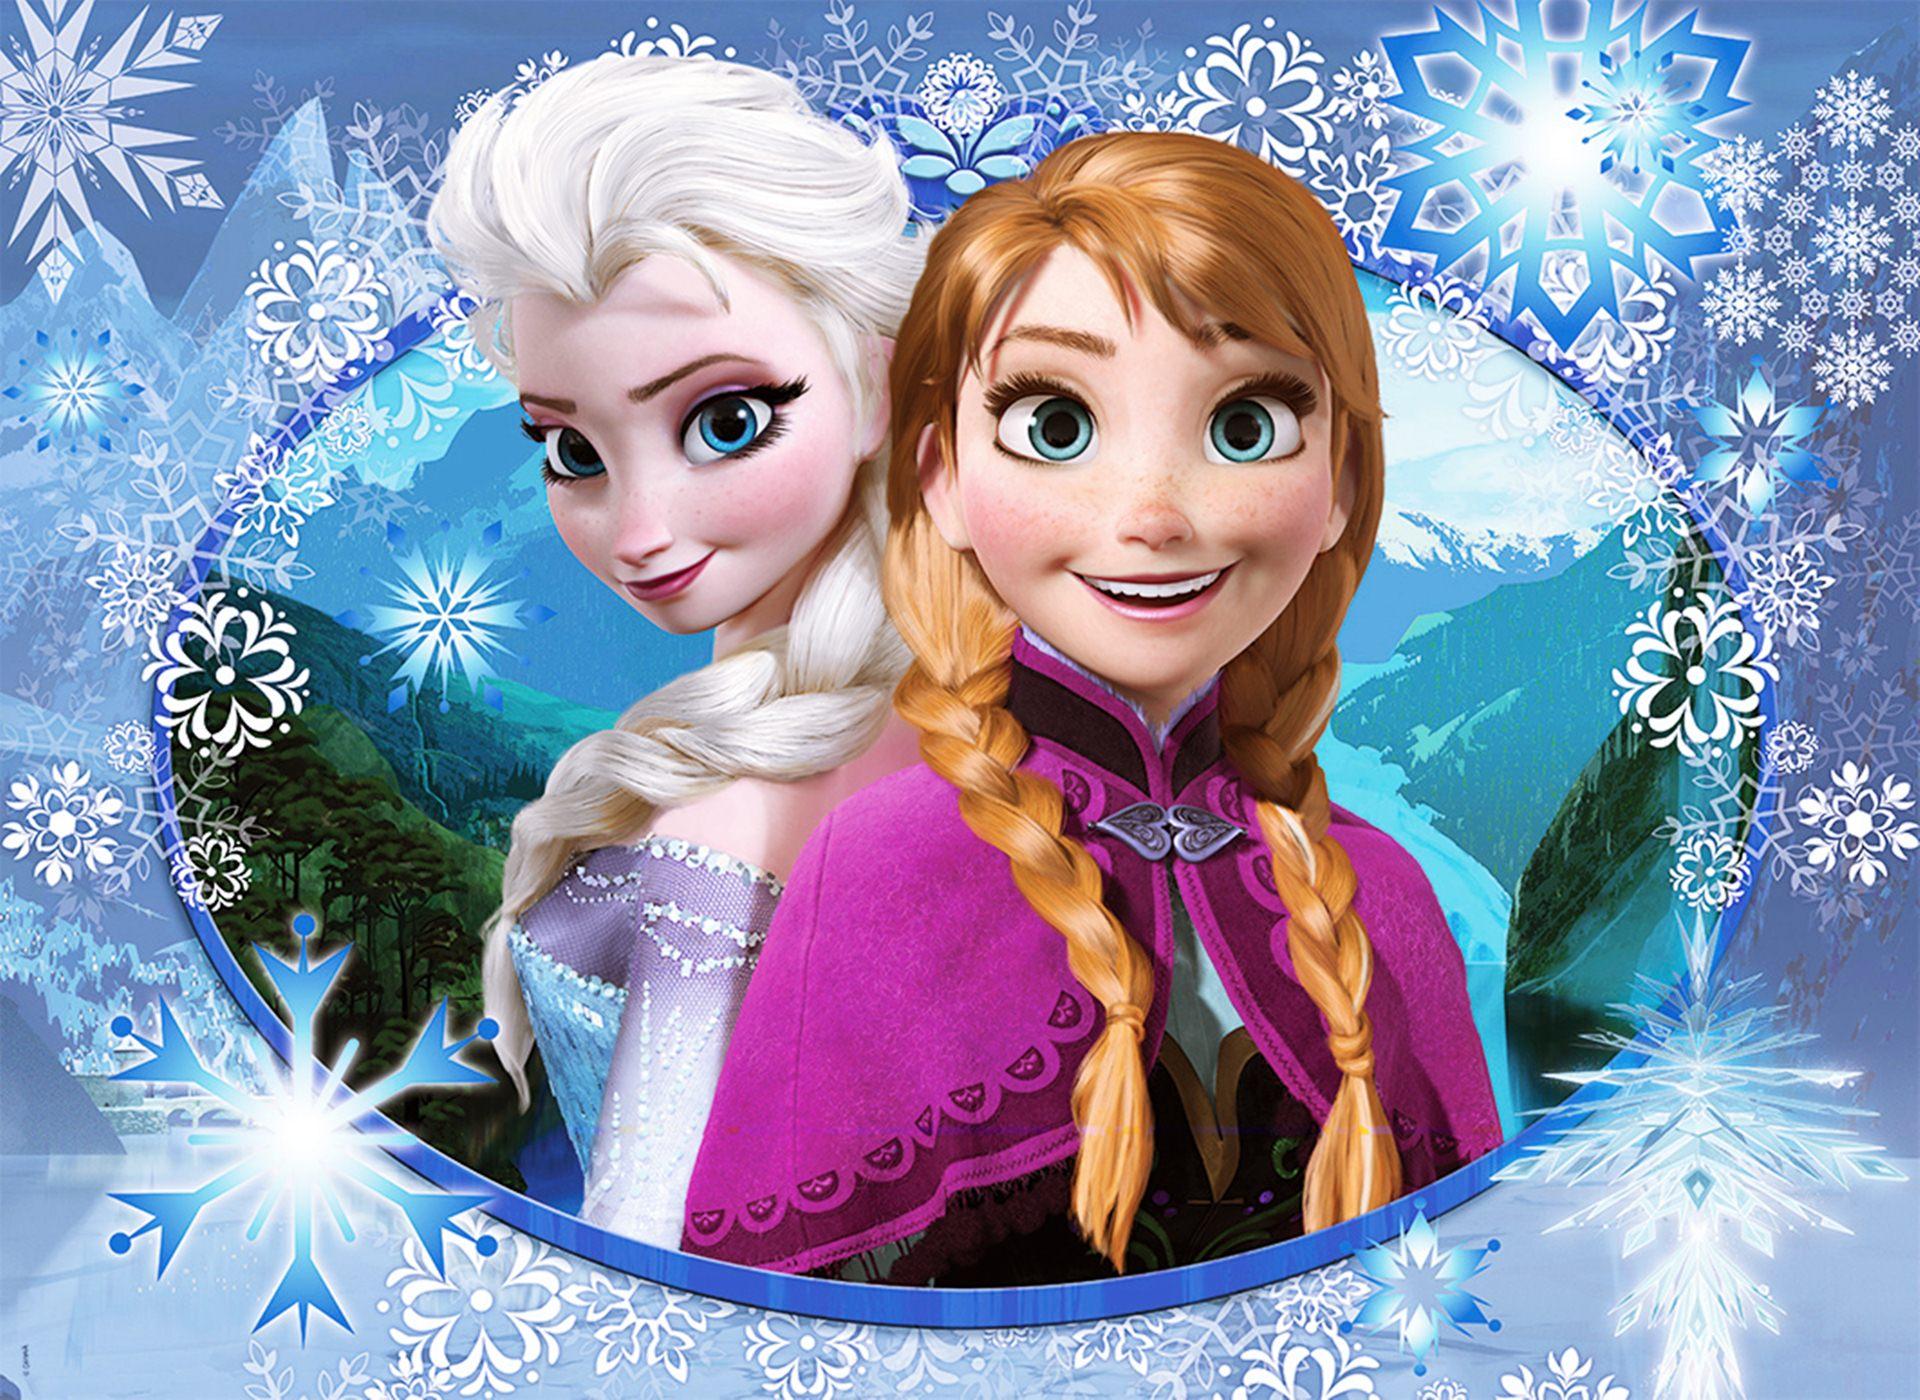 Wallpaper Frozen Elsa - WallpaperSafari